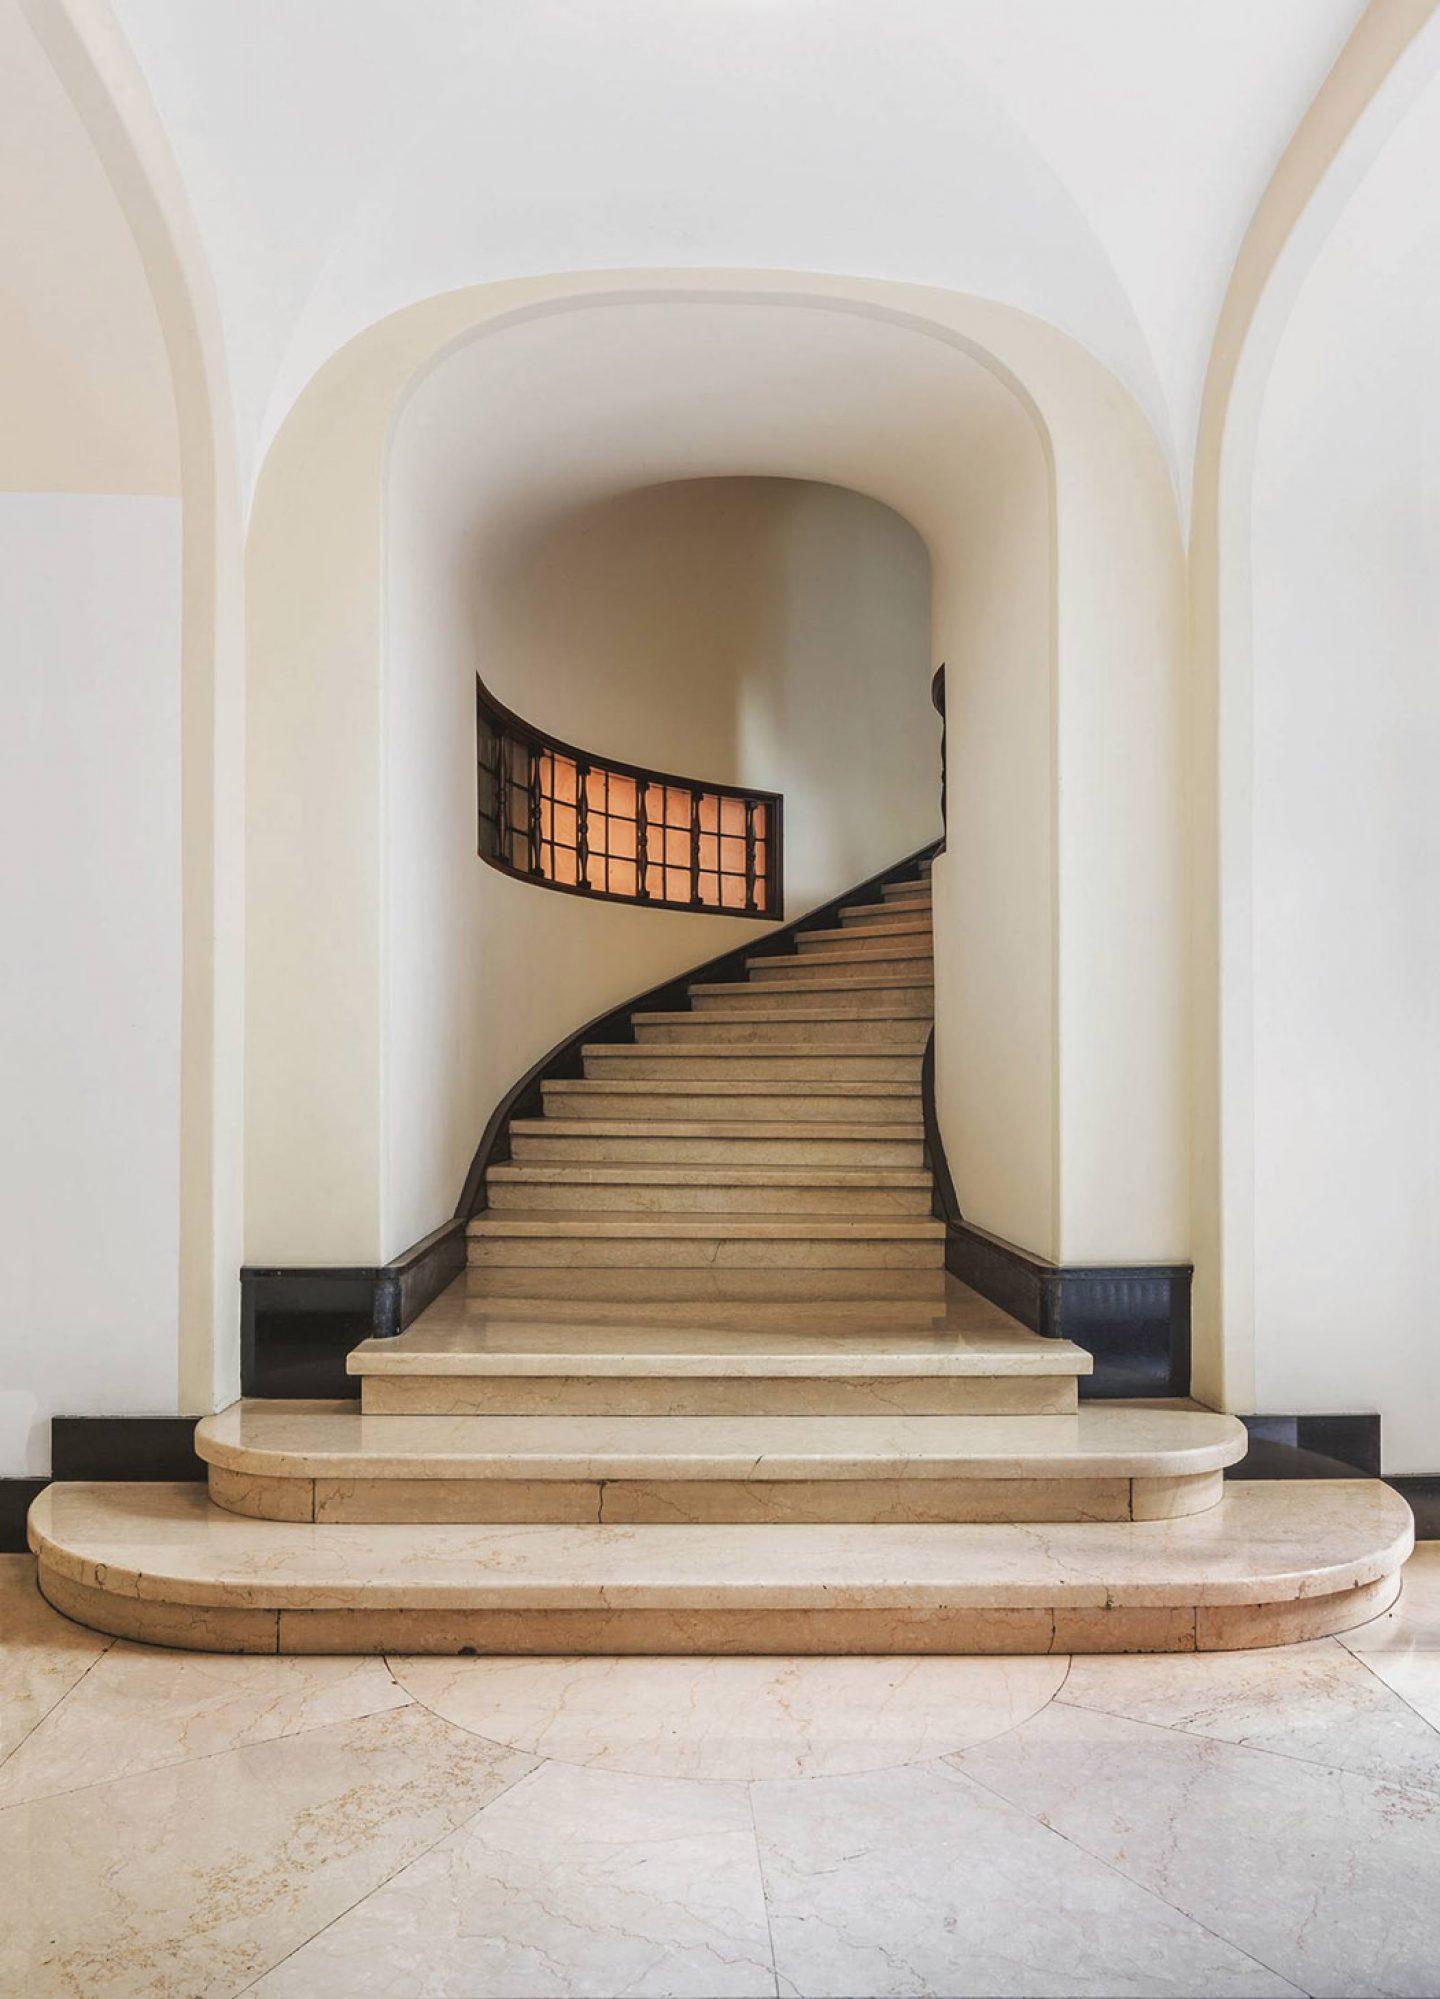 iGNANT_Architecture_Karl_Kolbitz_Taschen_Entryways_of_Milan_Ingressi_di_Milano_2